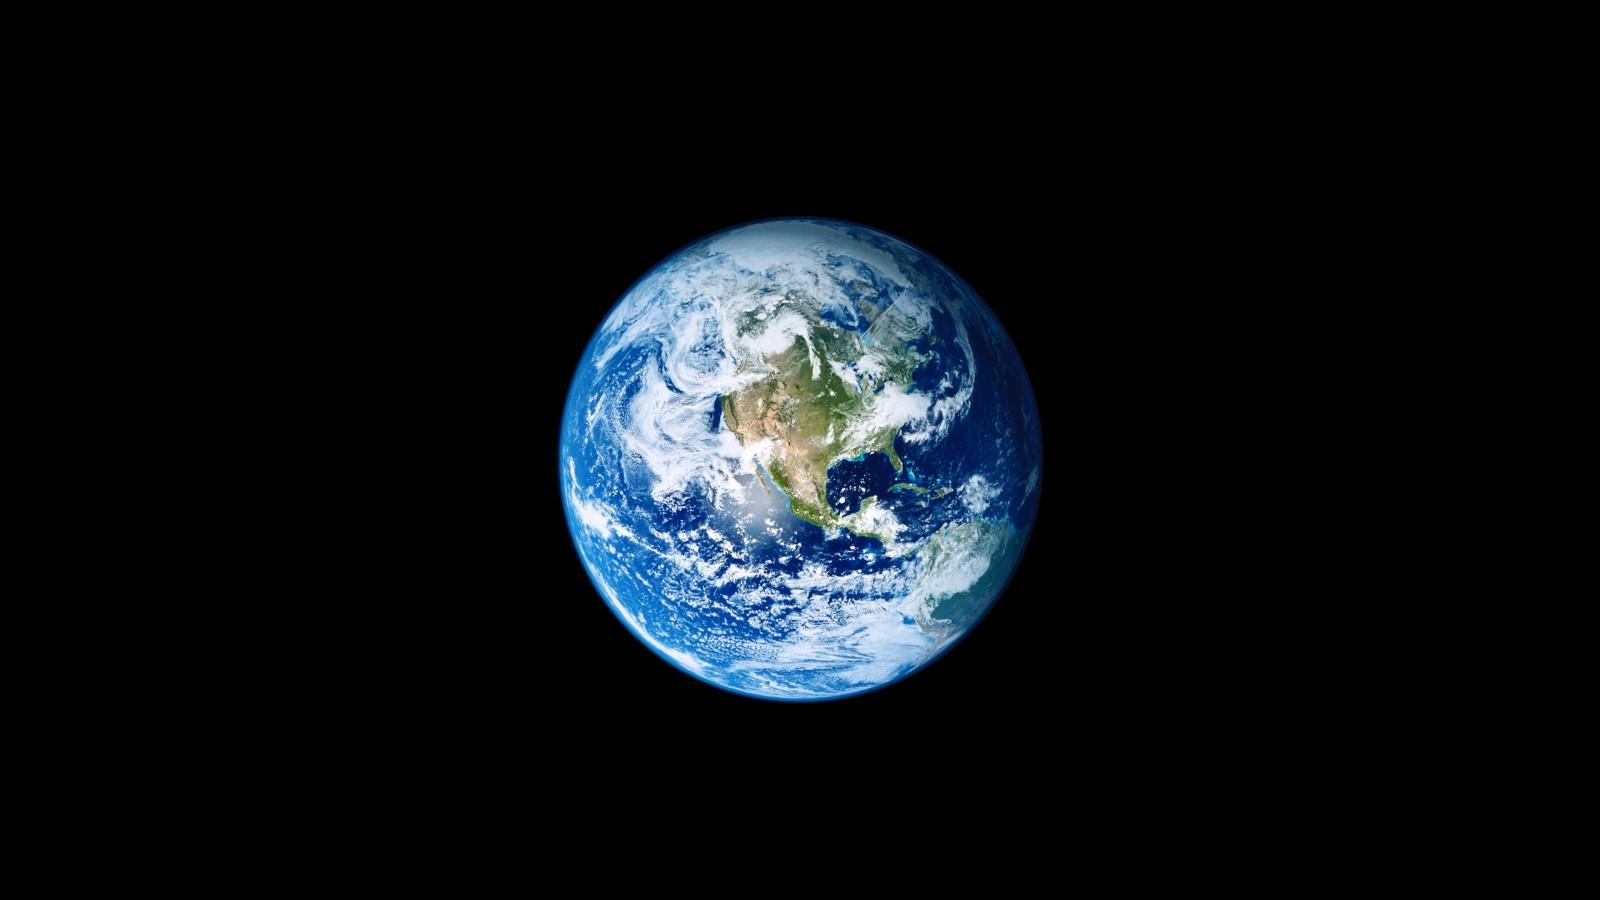 Hd Earth Wallpaper Widescreen Earth Ios 11 Iphone 8 Iphone X Stock 4k Wallpapers Hd